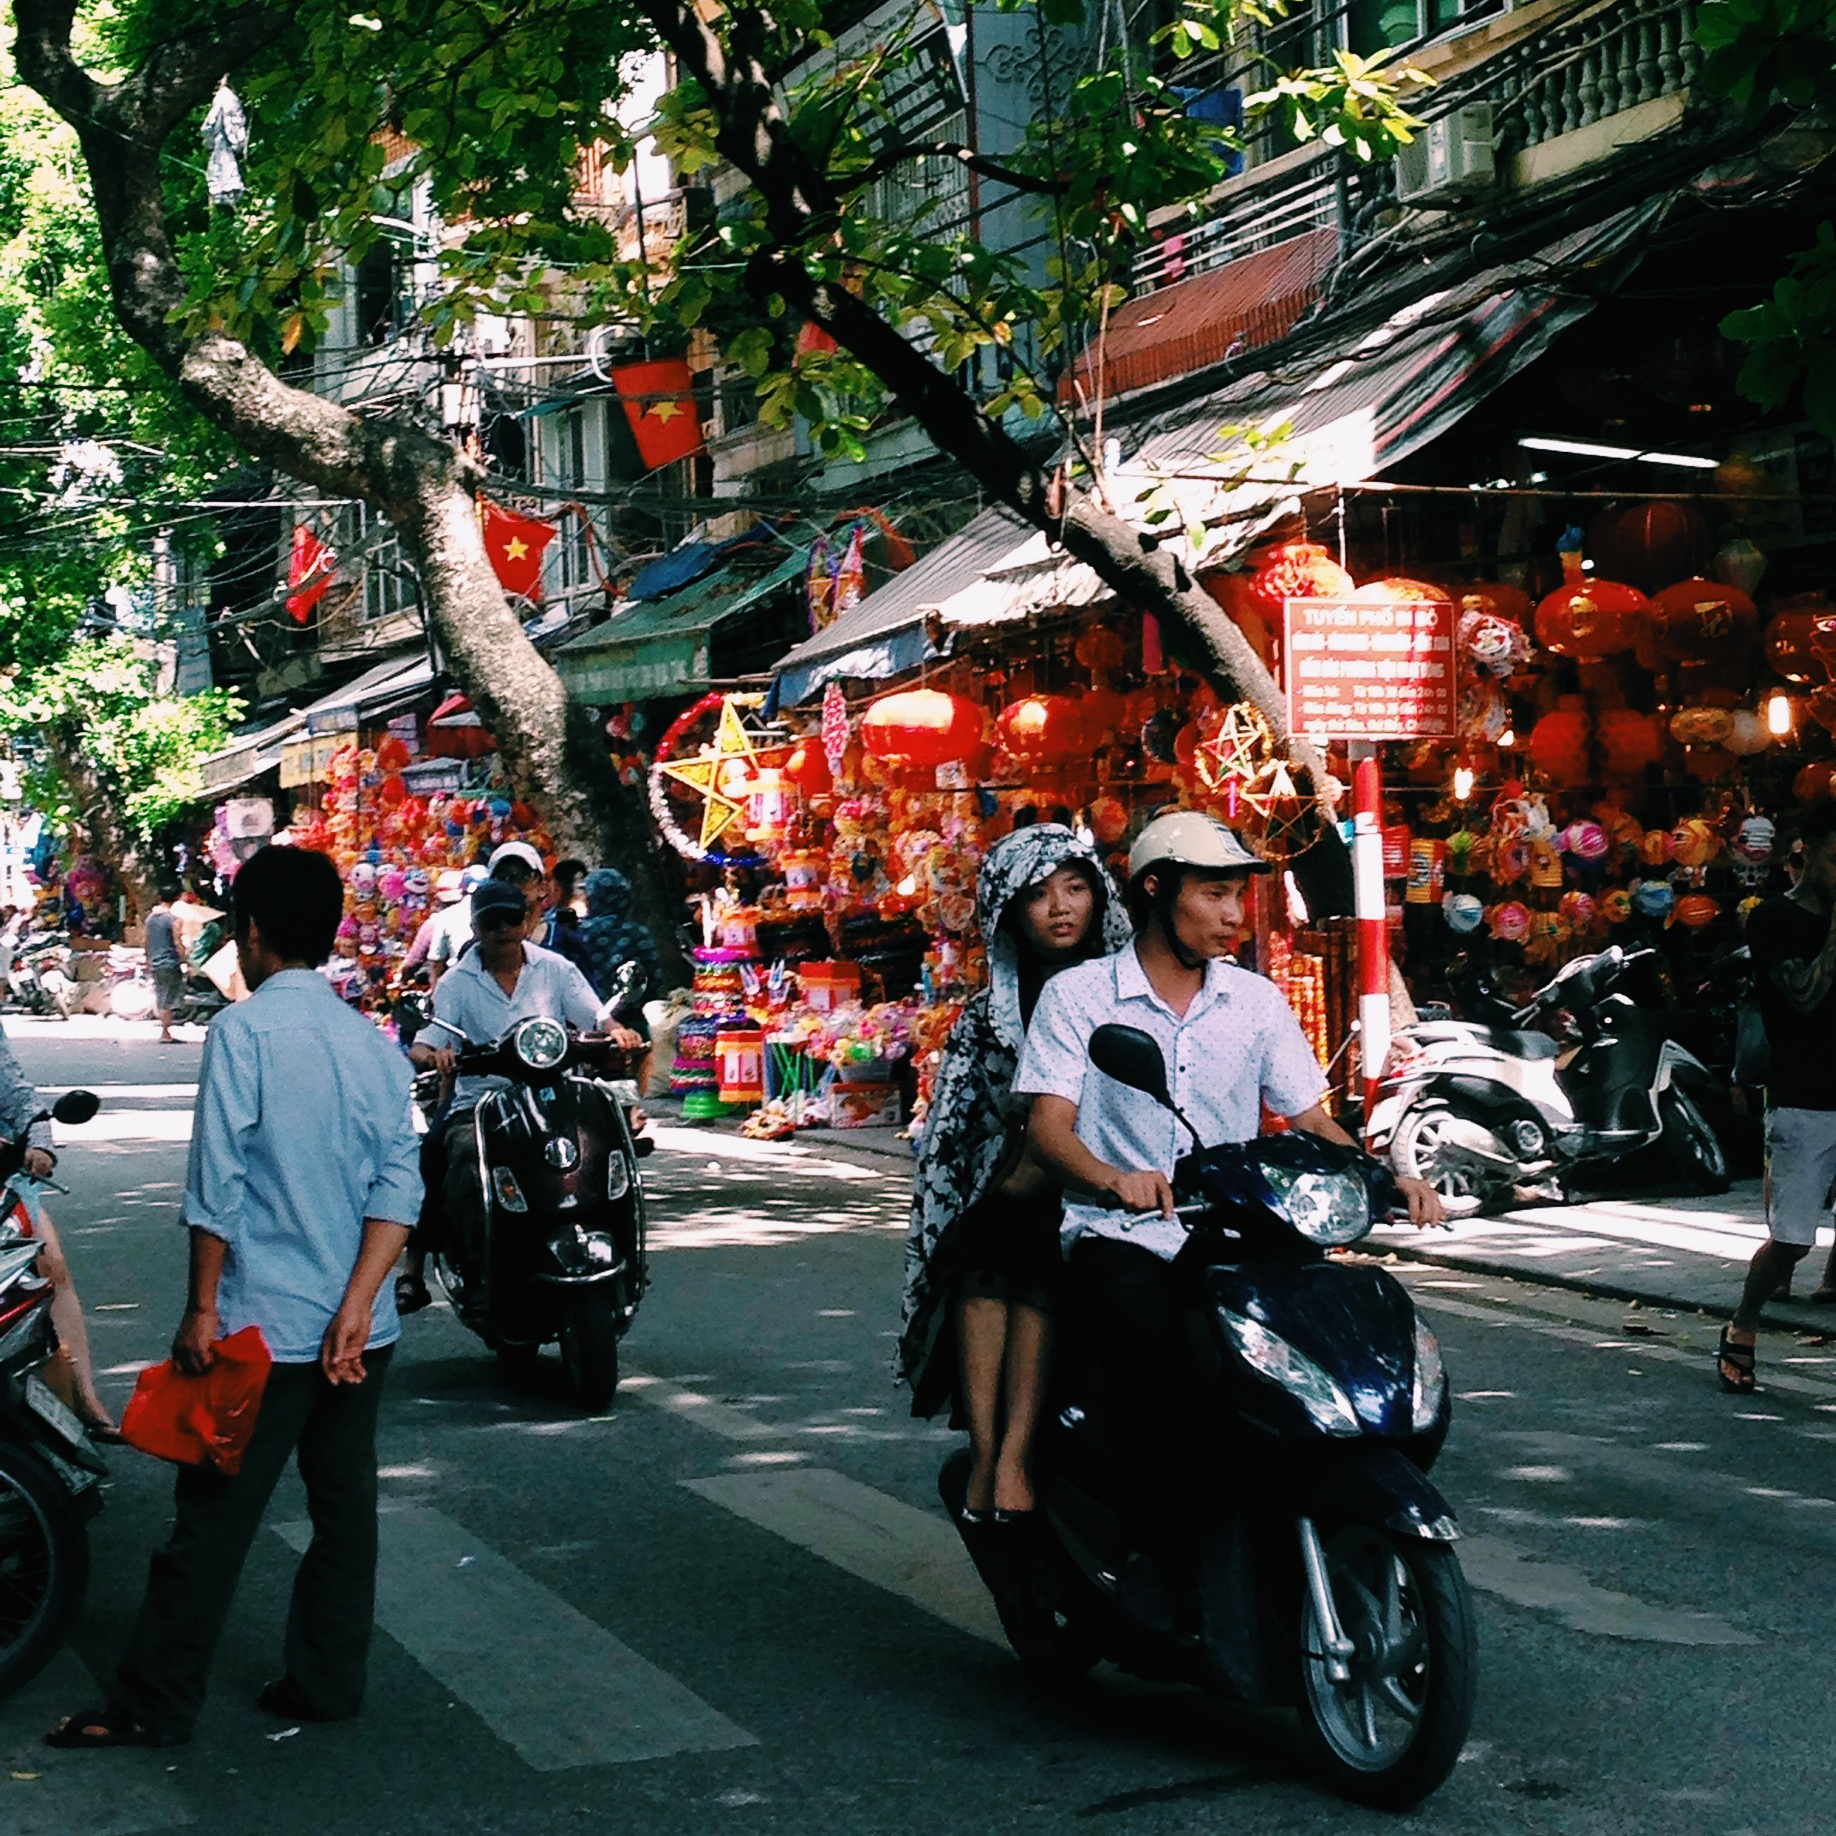 Couple on Motorbike in Hanoi, Vietnam - illumelation.com